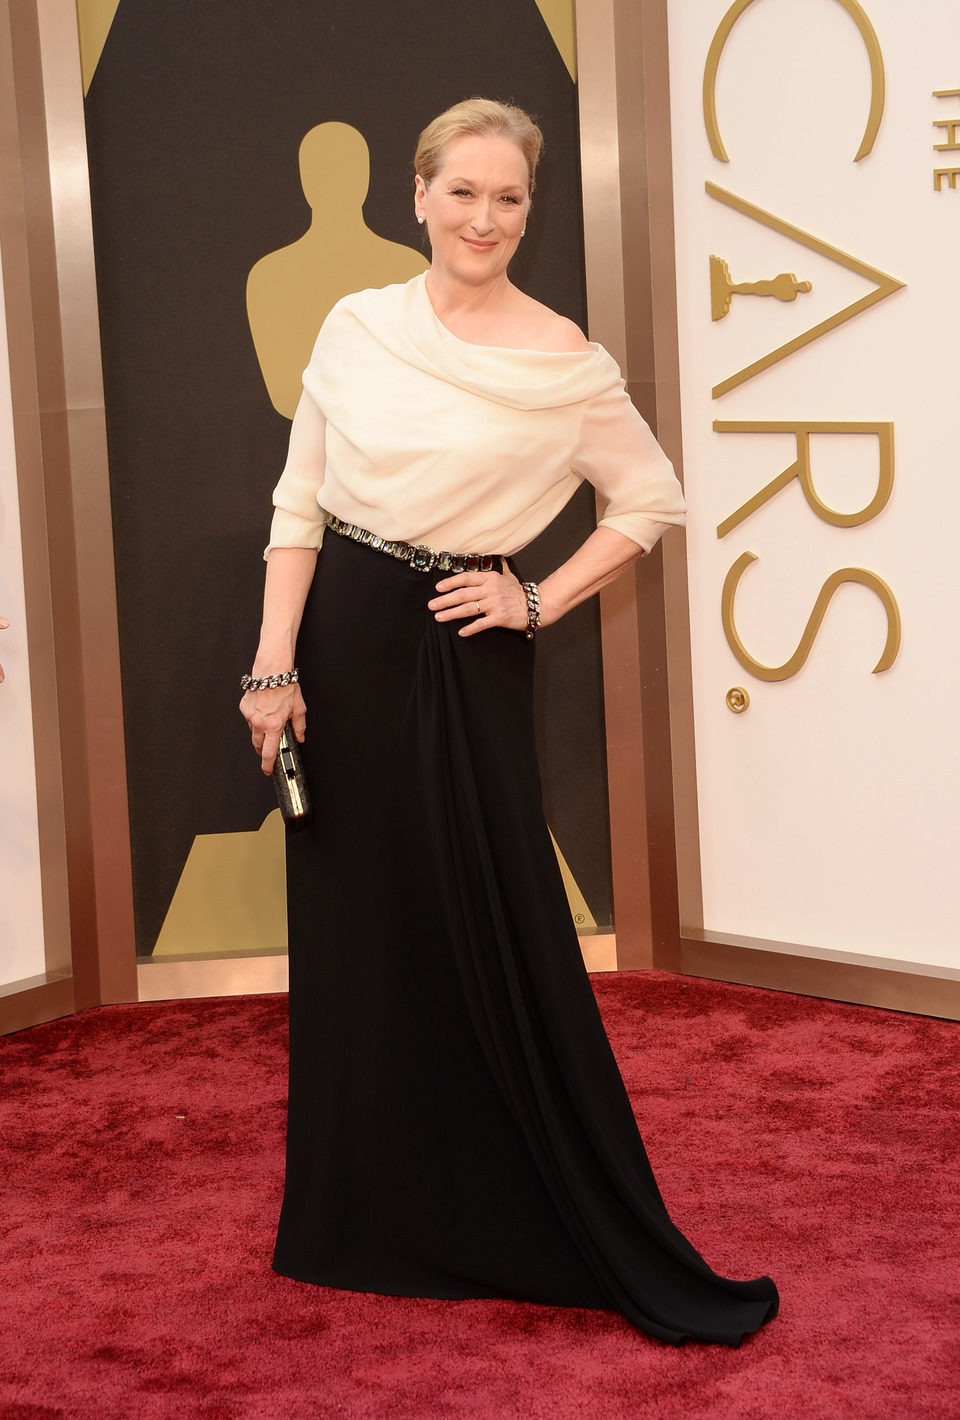 Meryl Streep en los Oscars 2014